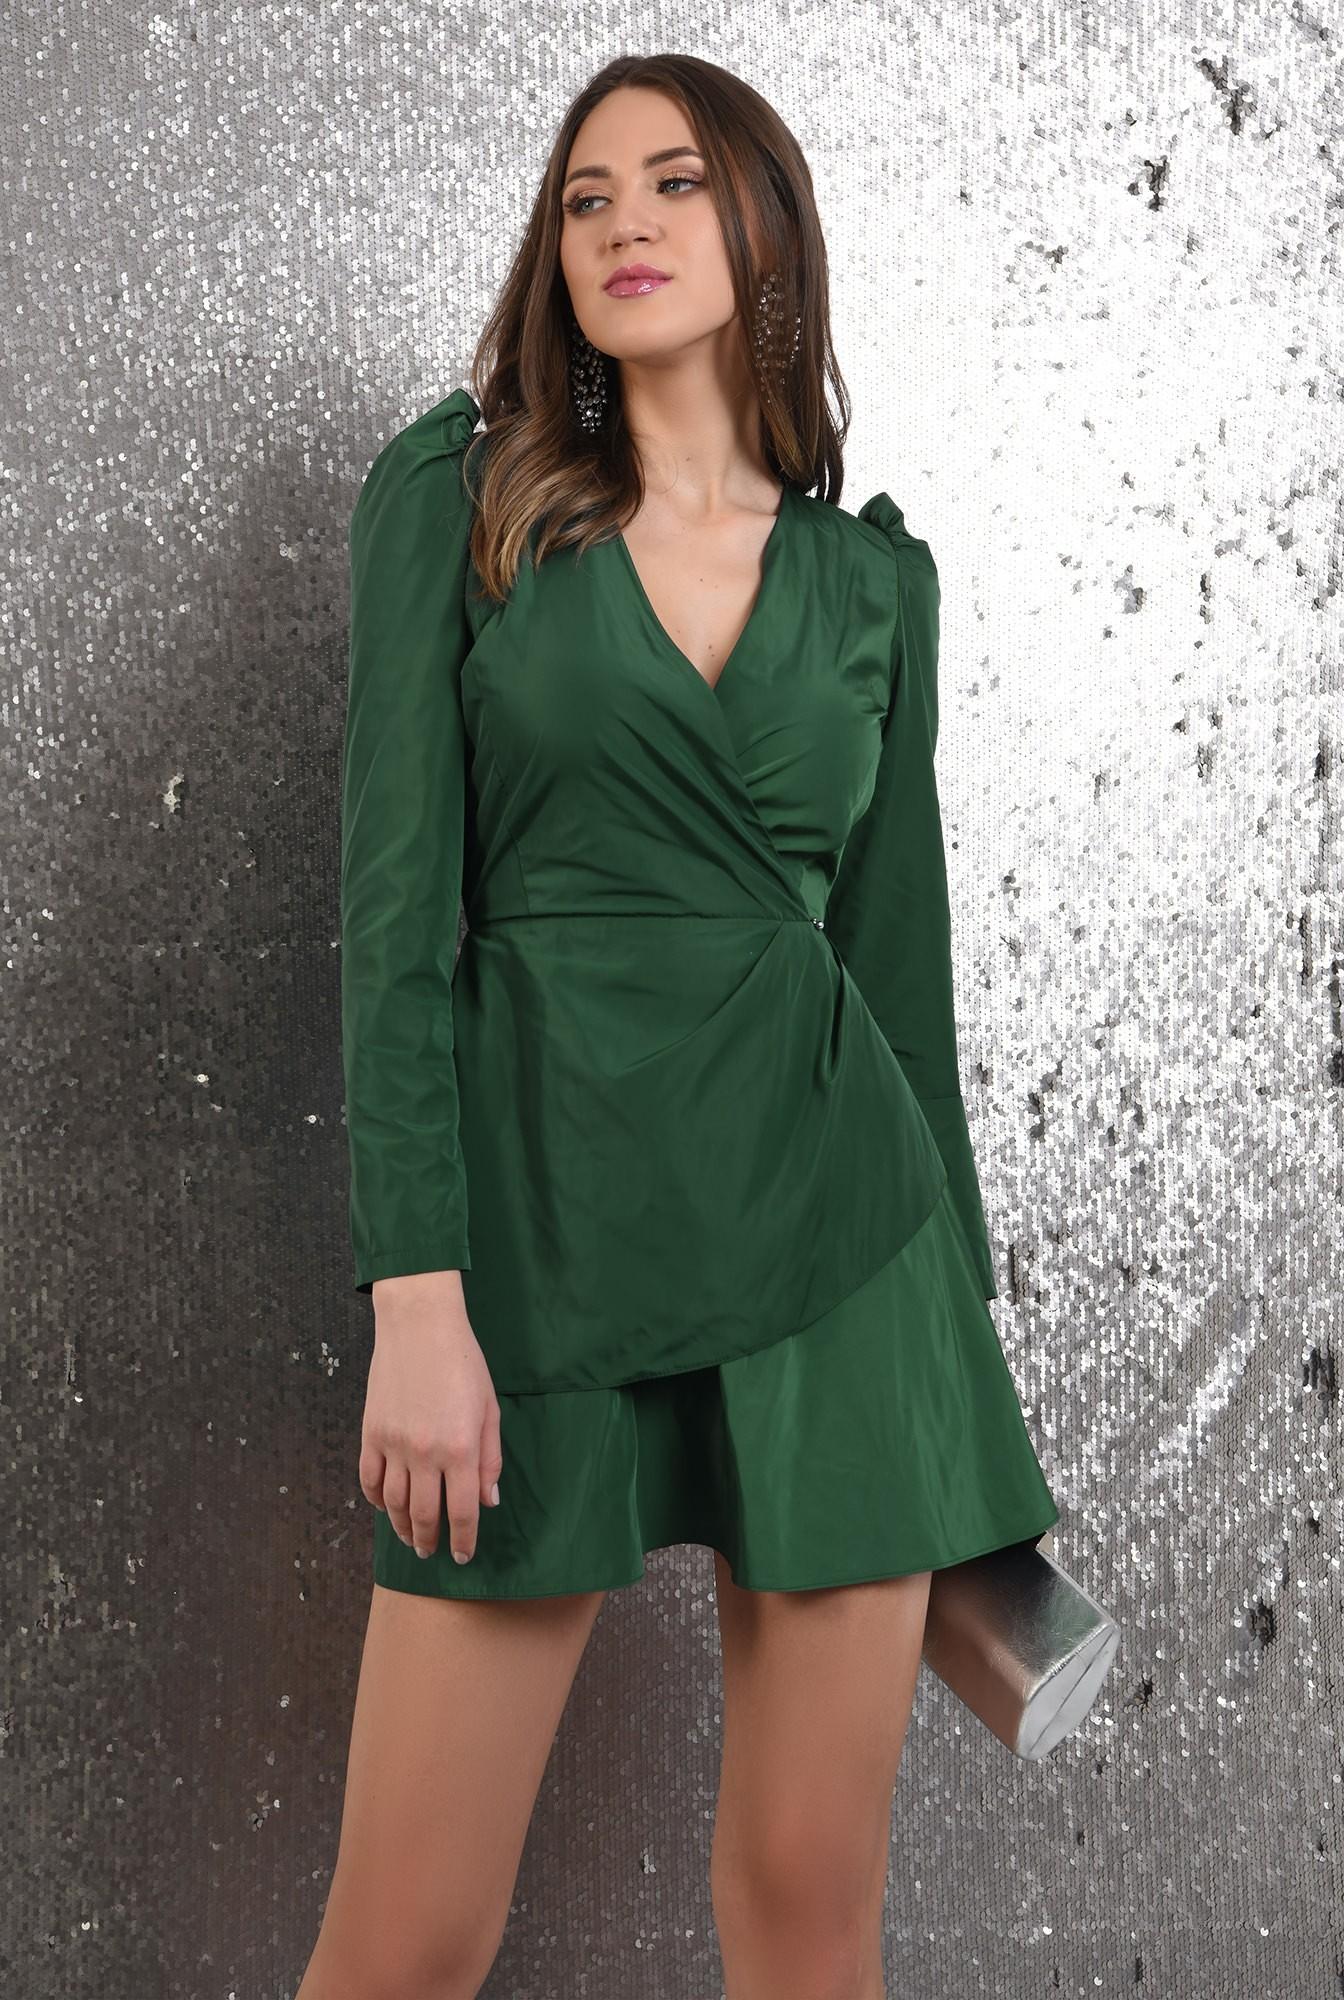 2 - 360 - rochie eleganta, petrecuta, cu pliuri decorative, maneci lungi, Poema